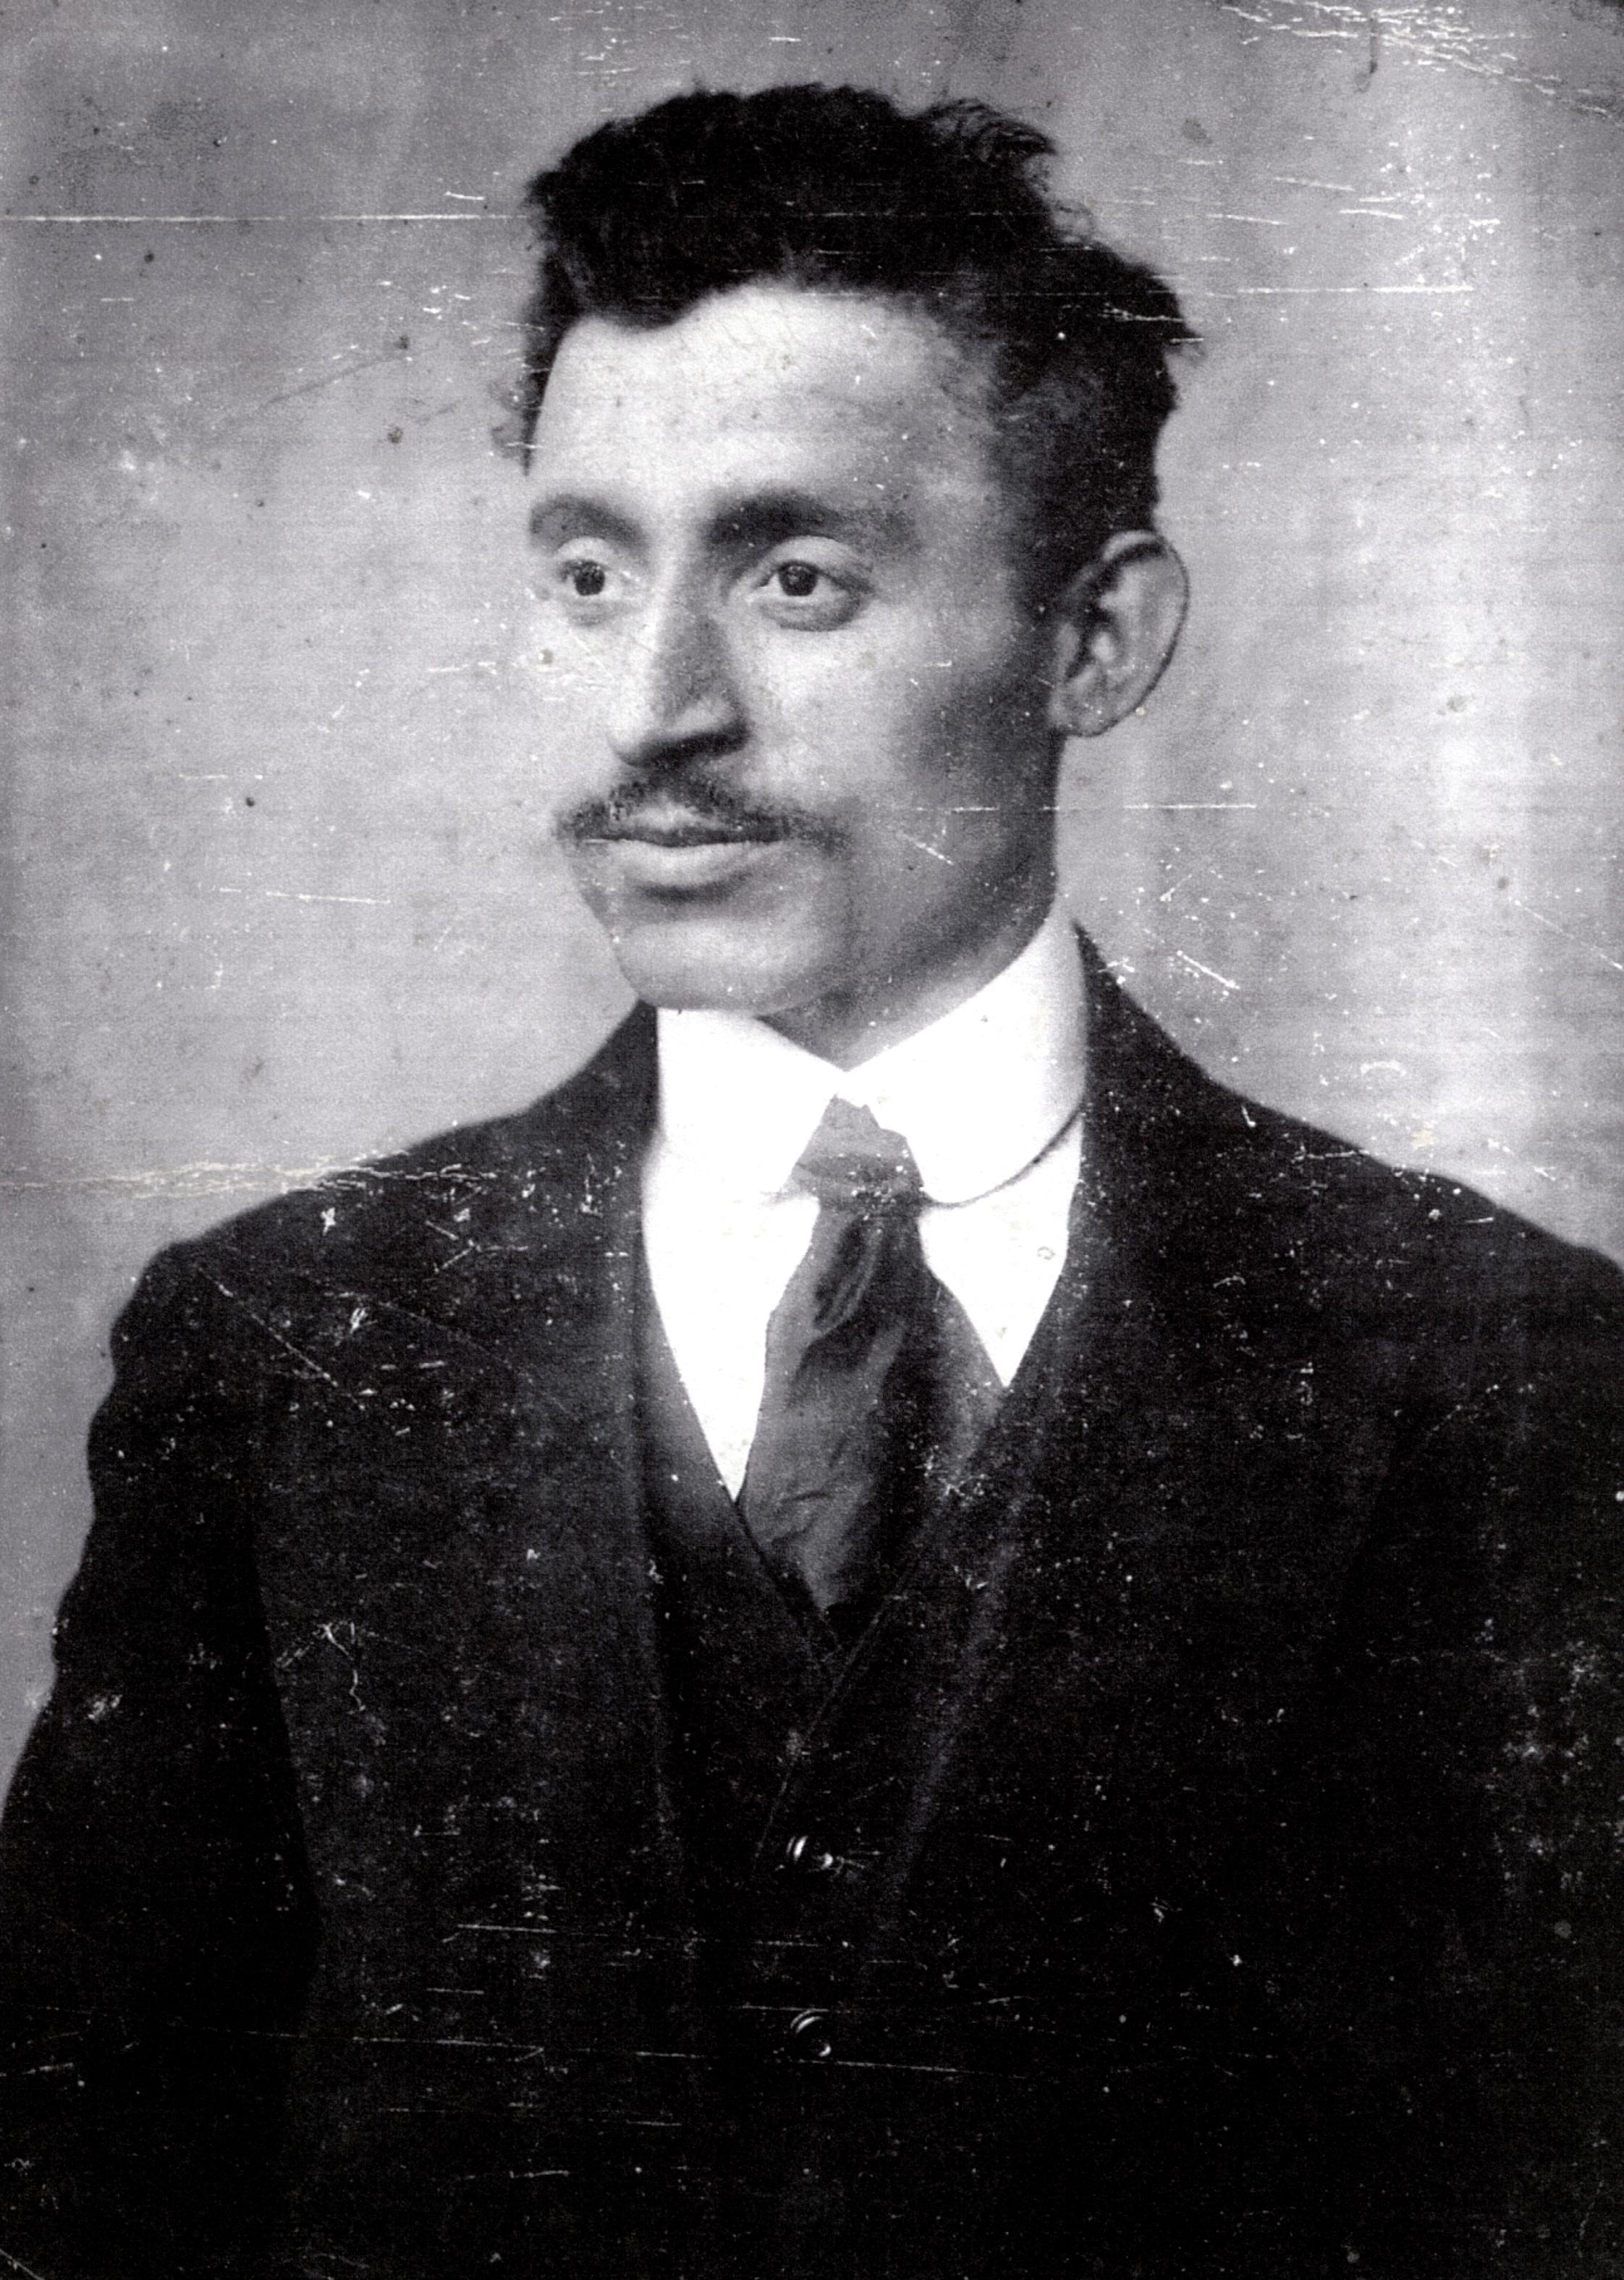 Rosa Gershenovich's father, Moisey Veltman